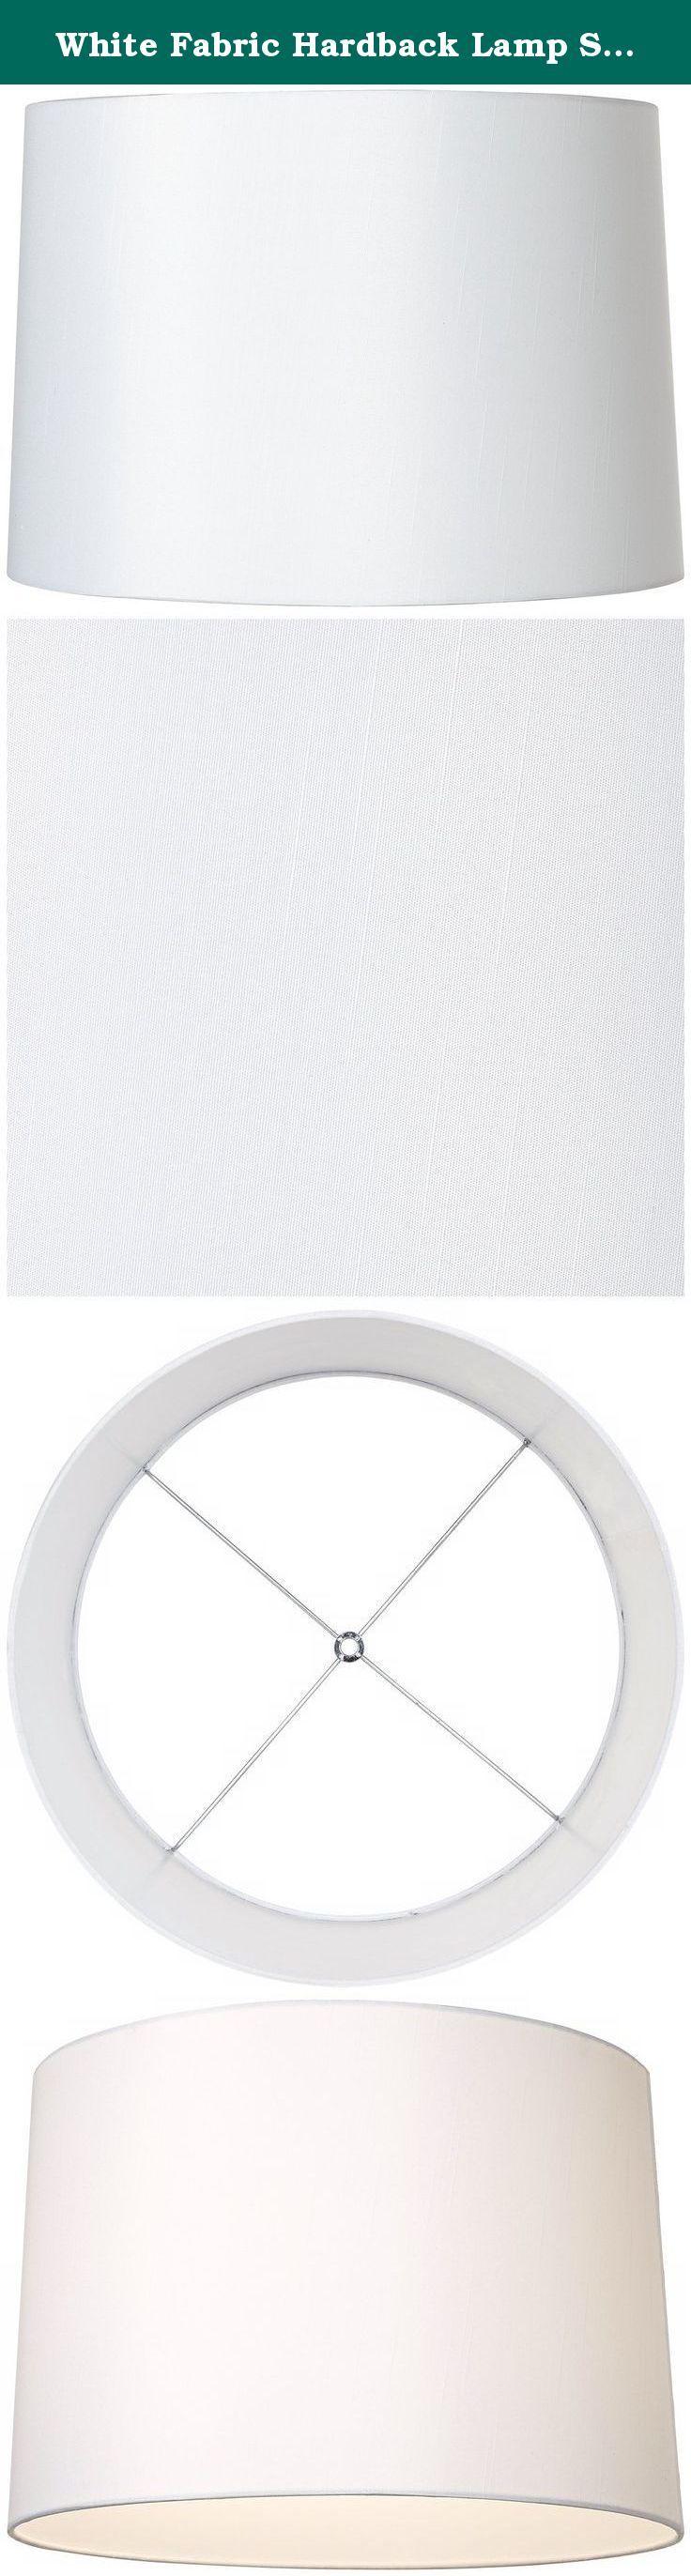 Table lamp harp sizes - White Fabric Hardback Lamp Shade 15x16x11 Spider This White Polyester Fabric Hardback Drum